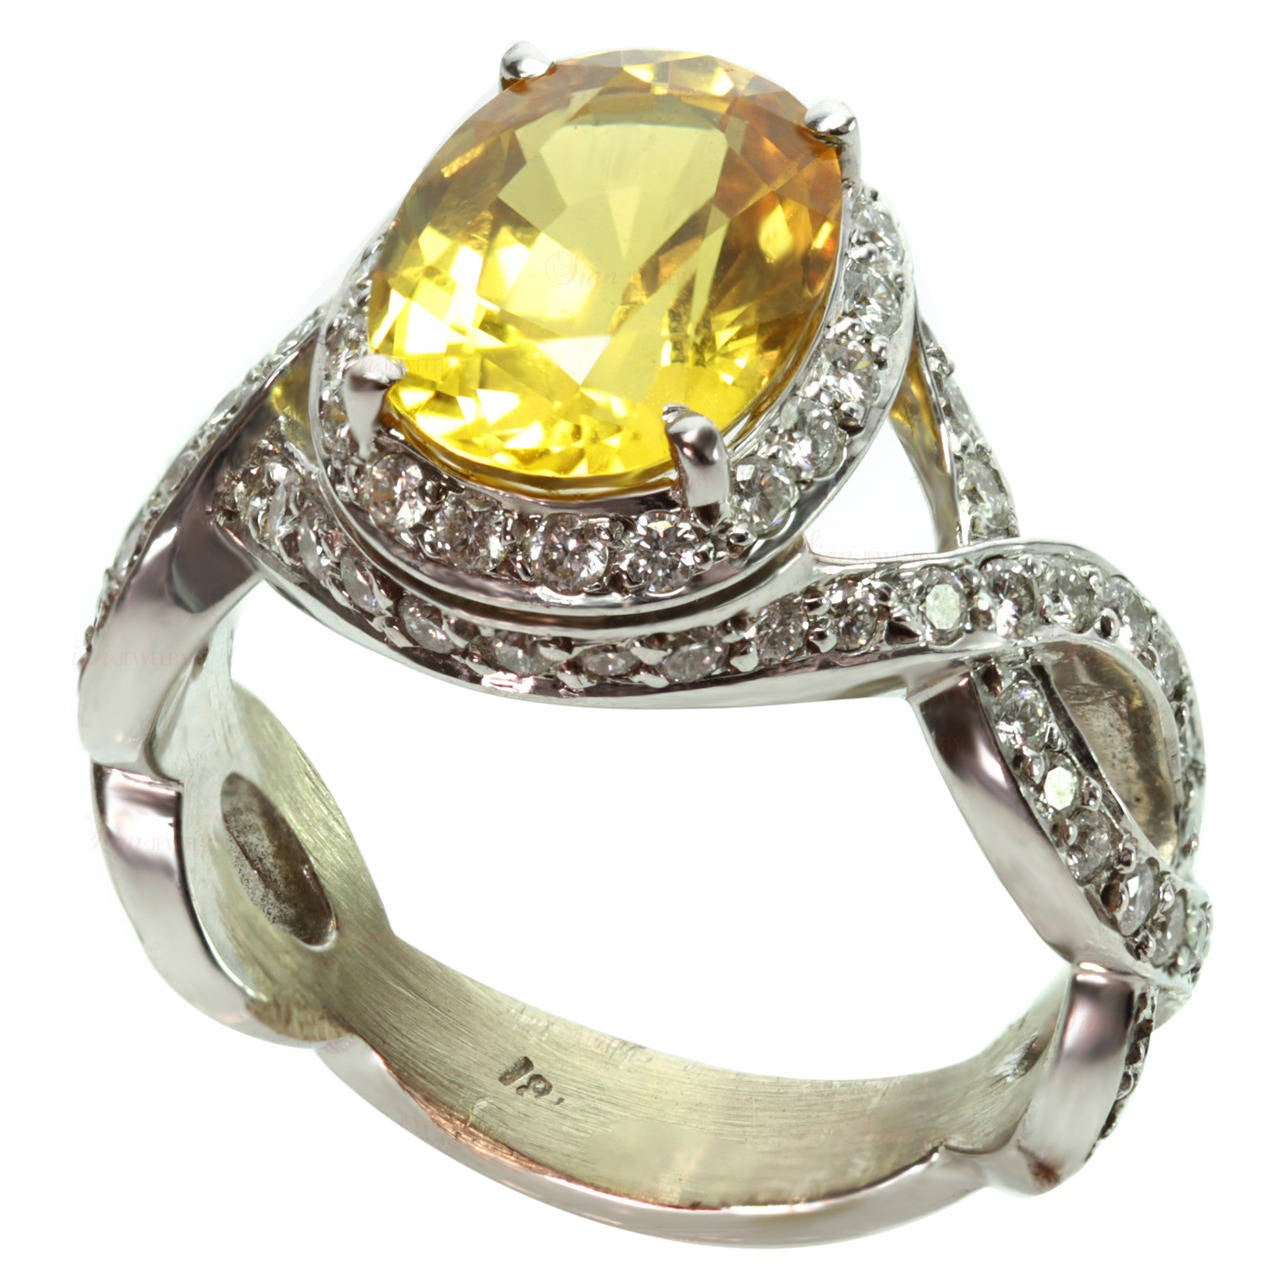 Lovable Sale Oval Yellow Sapphire Diamond G Cocktail Ring Inclusions Oval Yellow Sapphire Diamond G Cocktail Ring Sale At Yellow Sapphire Ring 14kyg Woman Yellow Sapphire Ring wedding rings Yellow Sapphire Ring